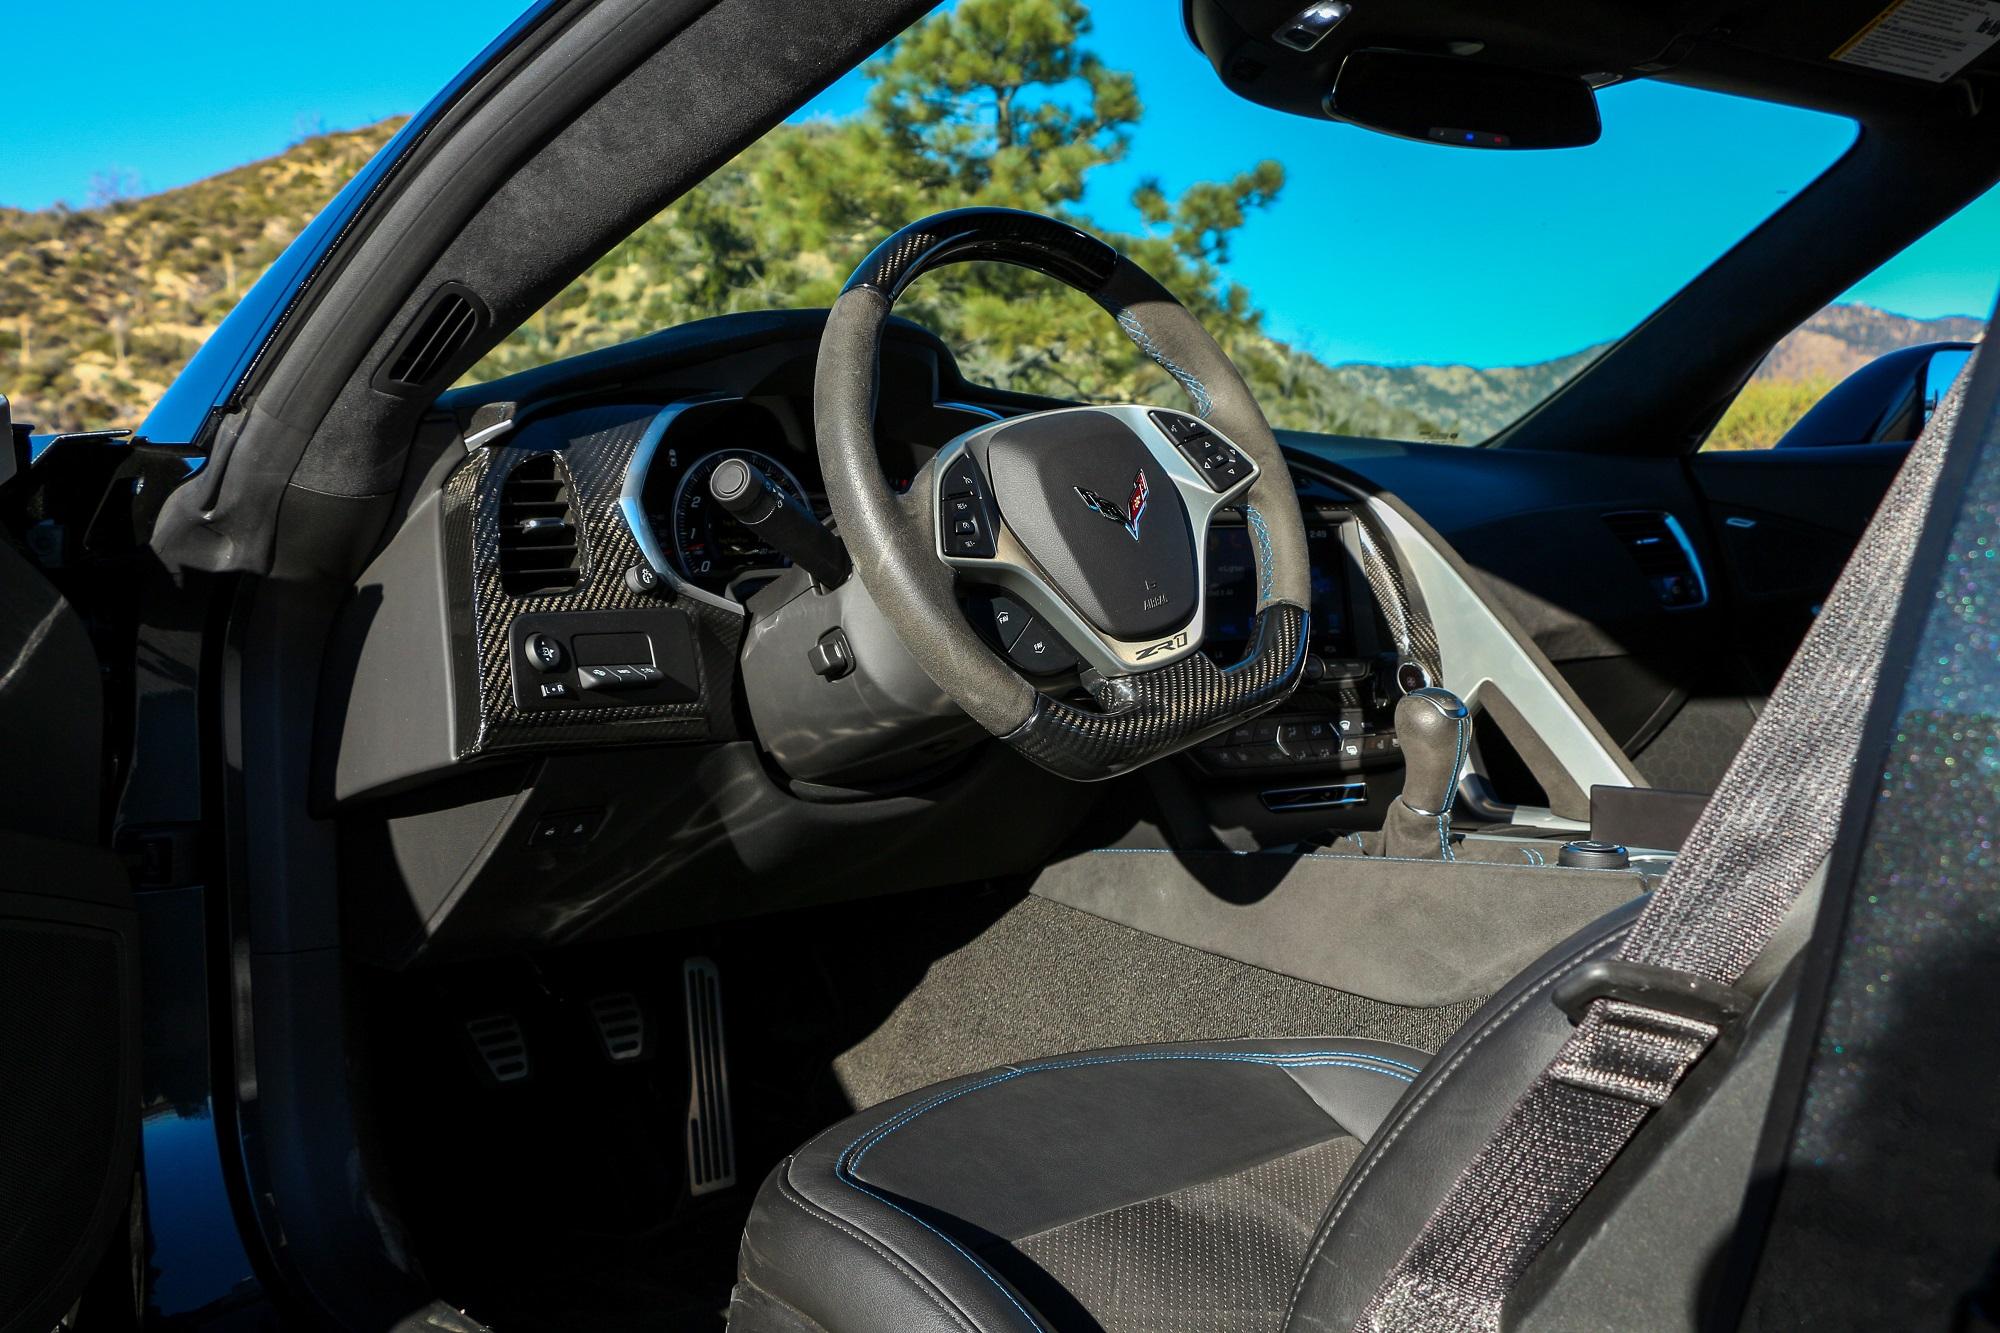 2019 Corvette ZR1 Drive Review Interior Exterior Options Colors Transmission Engine Brakes Tires Handling Pictures Wallpaper Jake Stumph